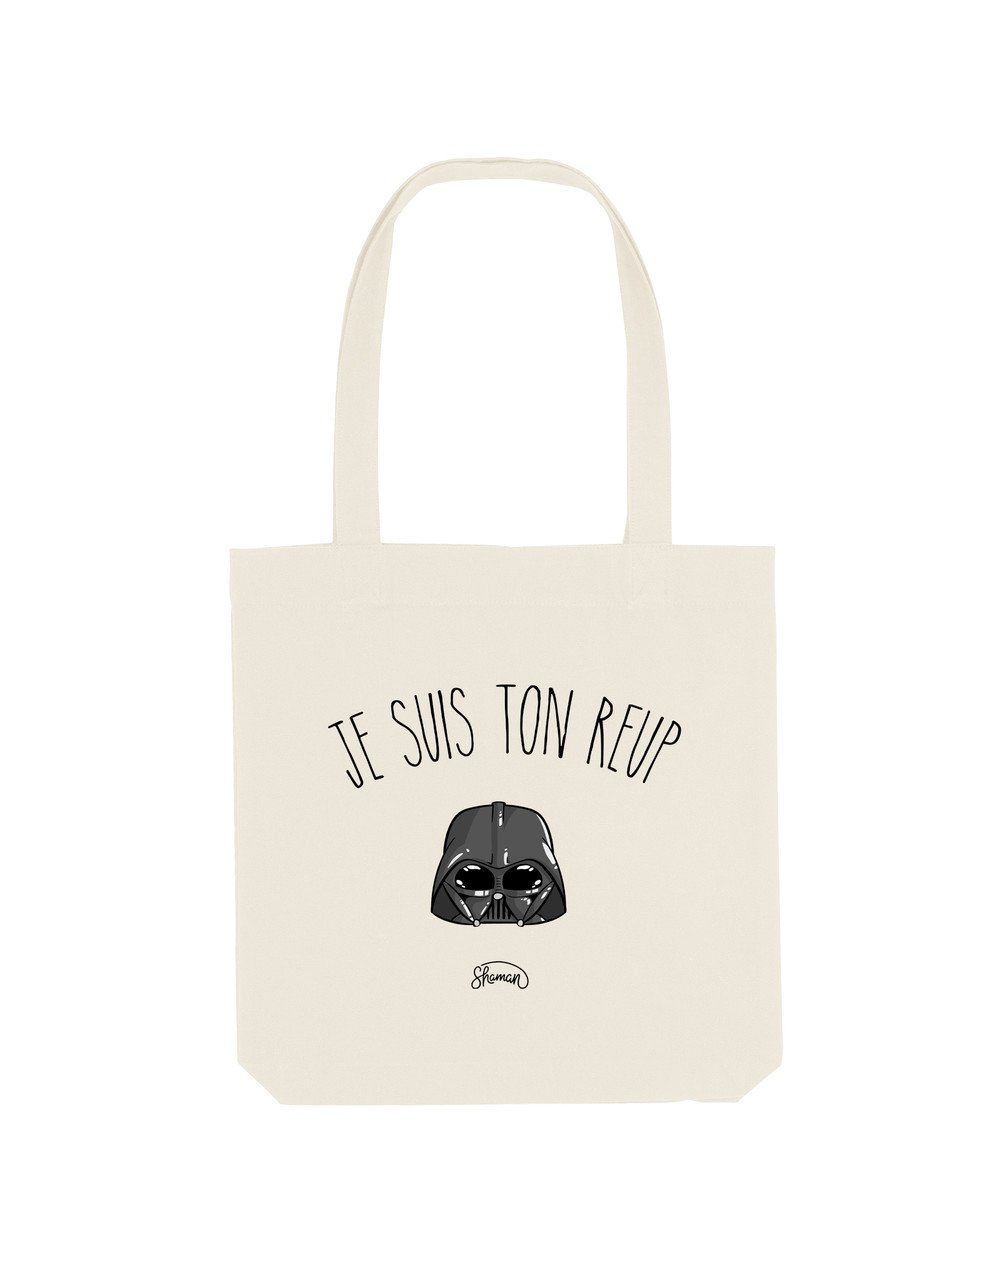 TON REUP - Tote Bag  Natural  en coton